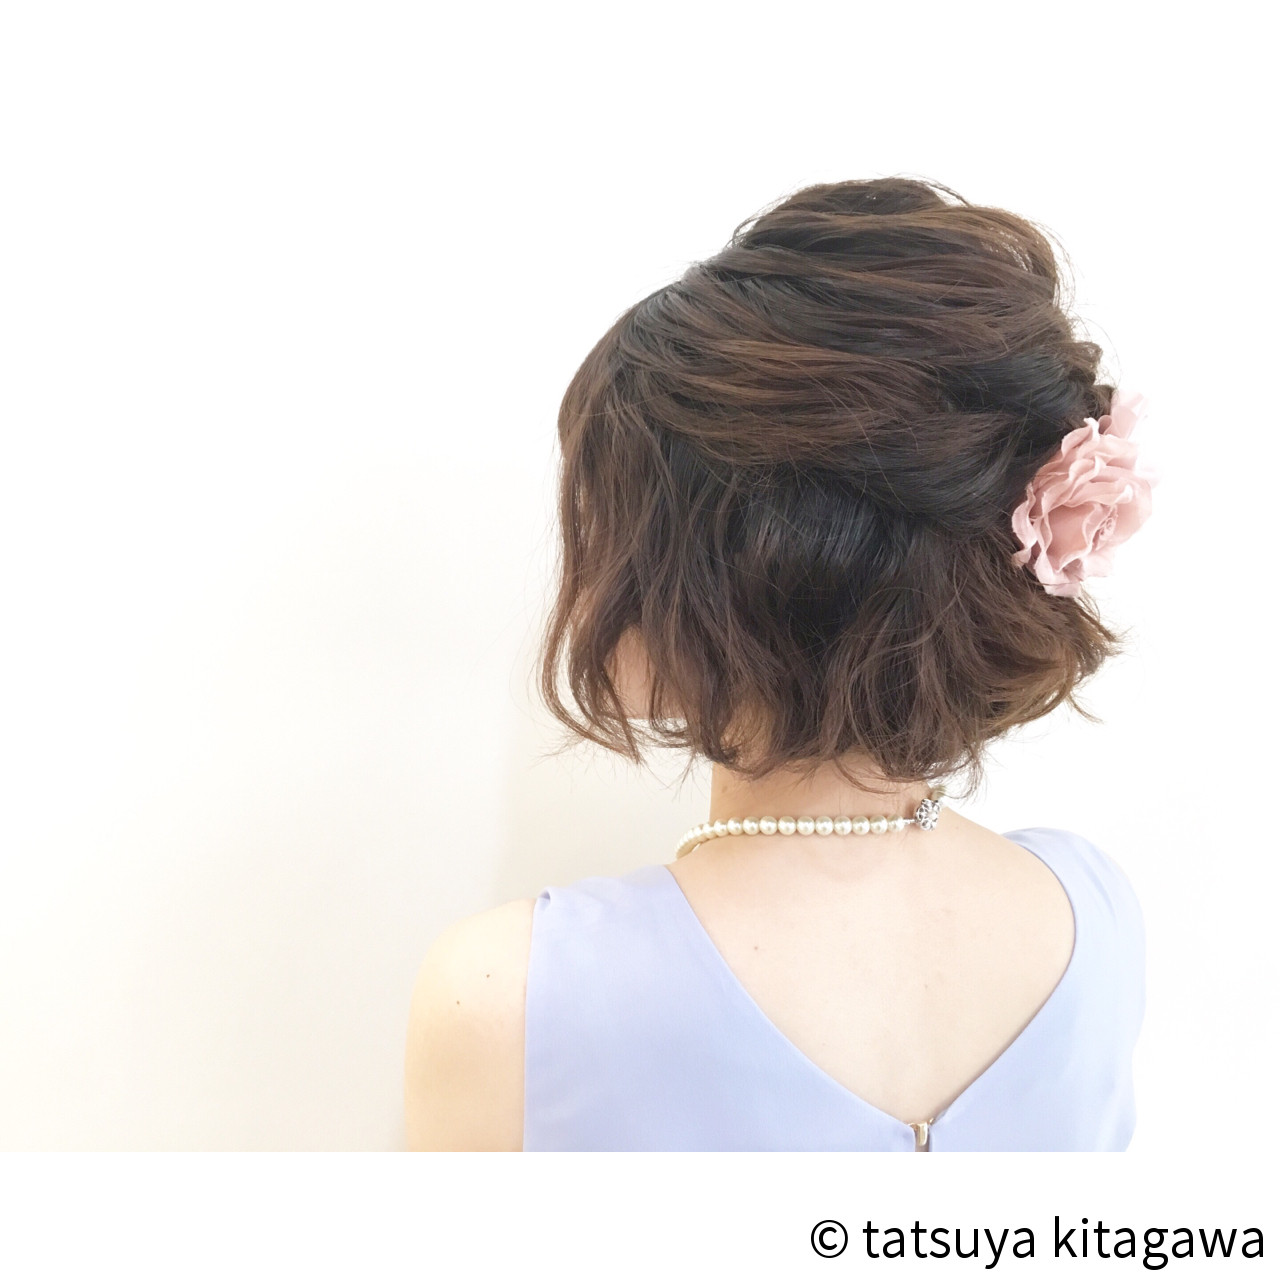 today's hair style☆クラリール . ボブハーフアップ☆ アゴラインボブのパーマ風ふんわりハーフアップ♪ . HAIR: @ta2tatsu